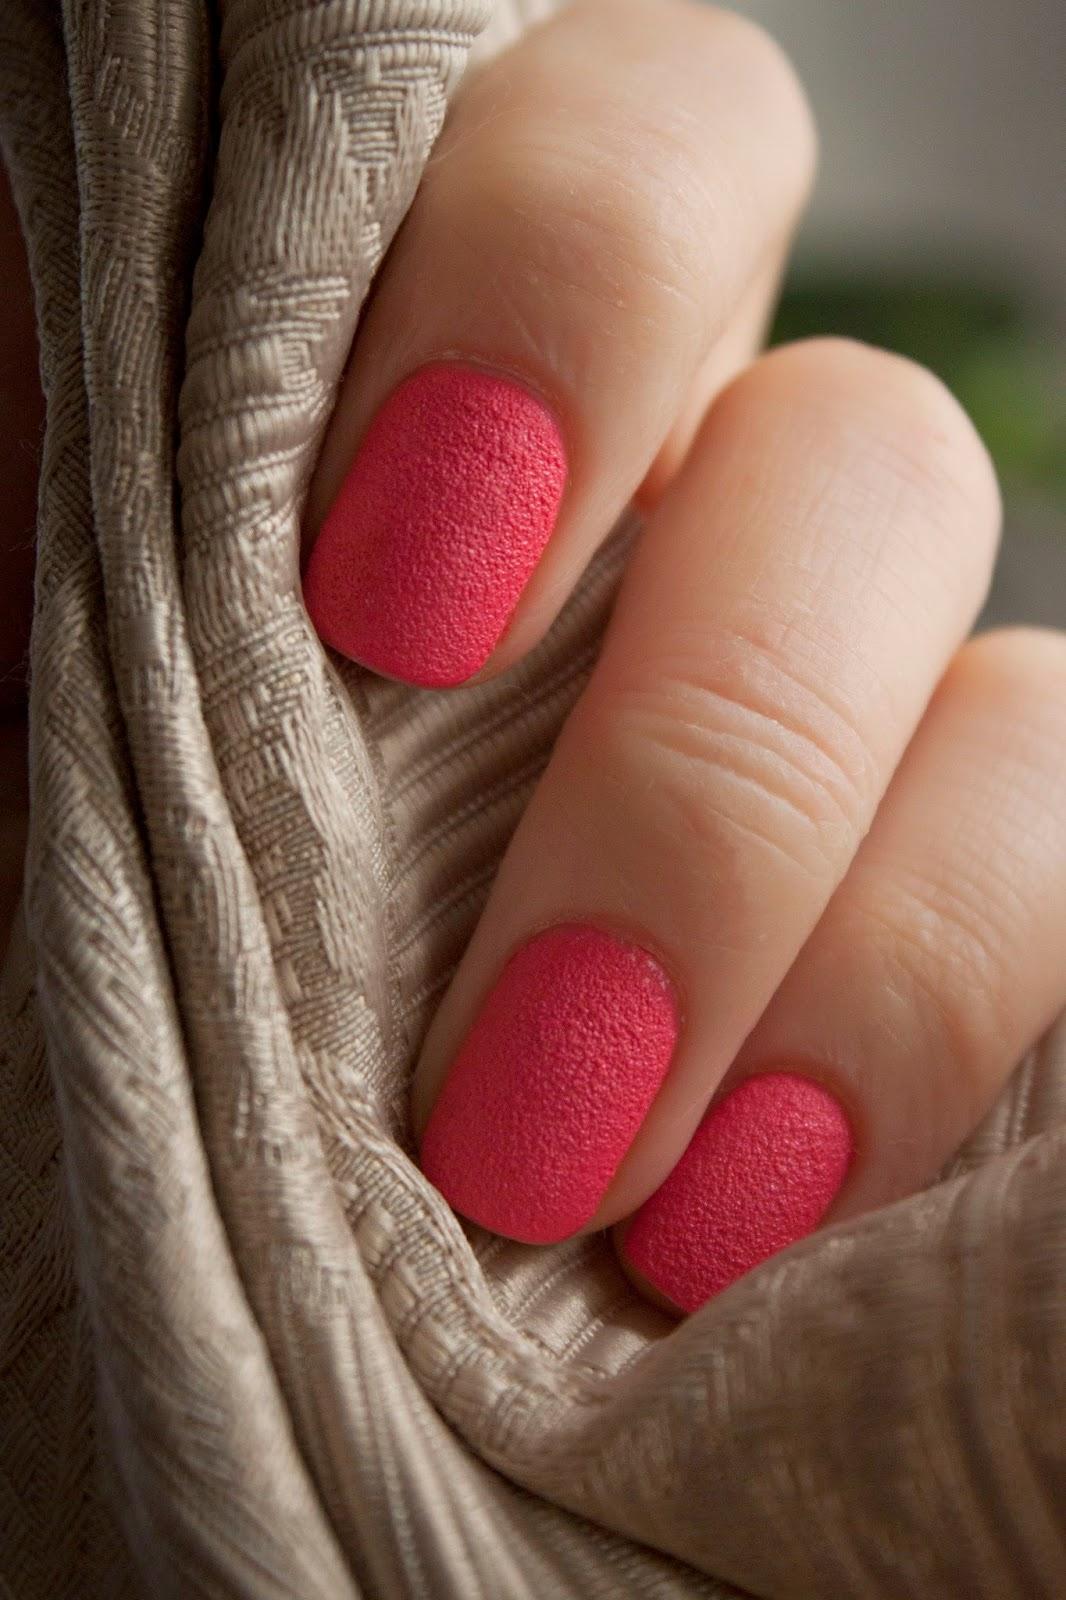 Ногти с сахарным лаком